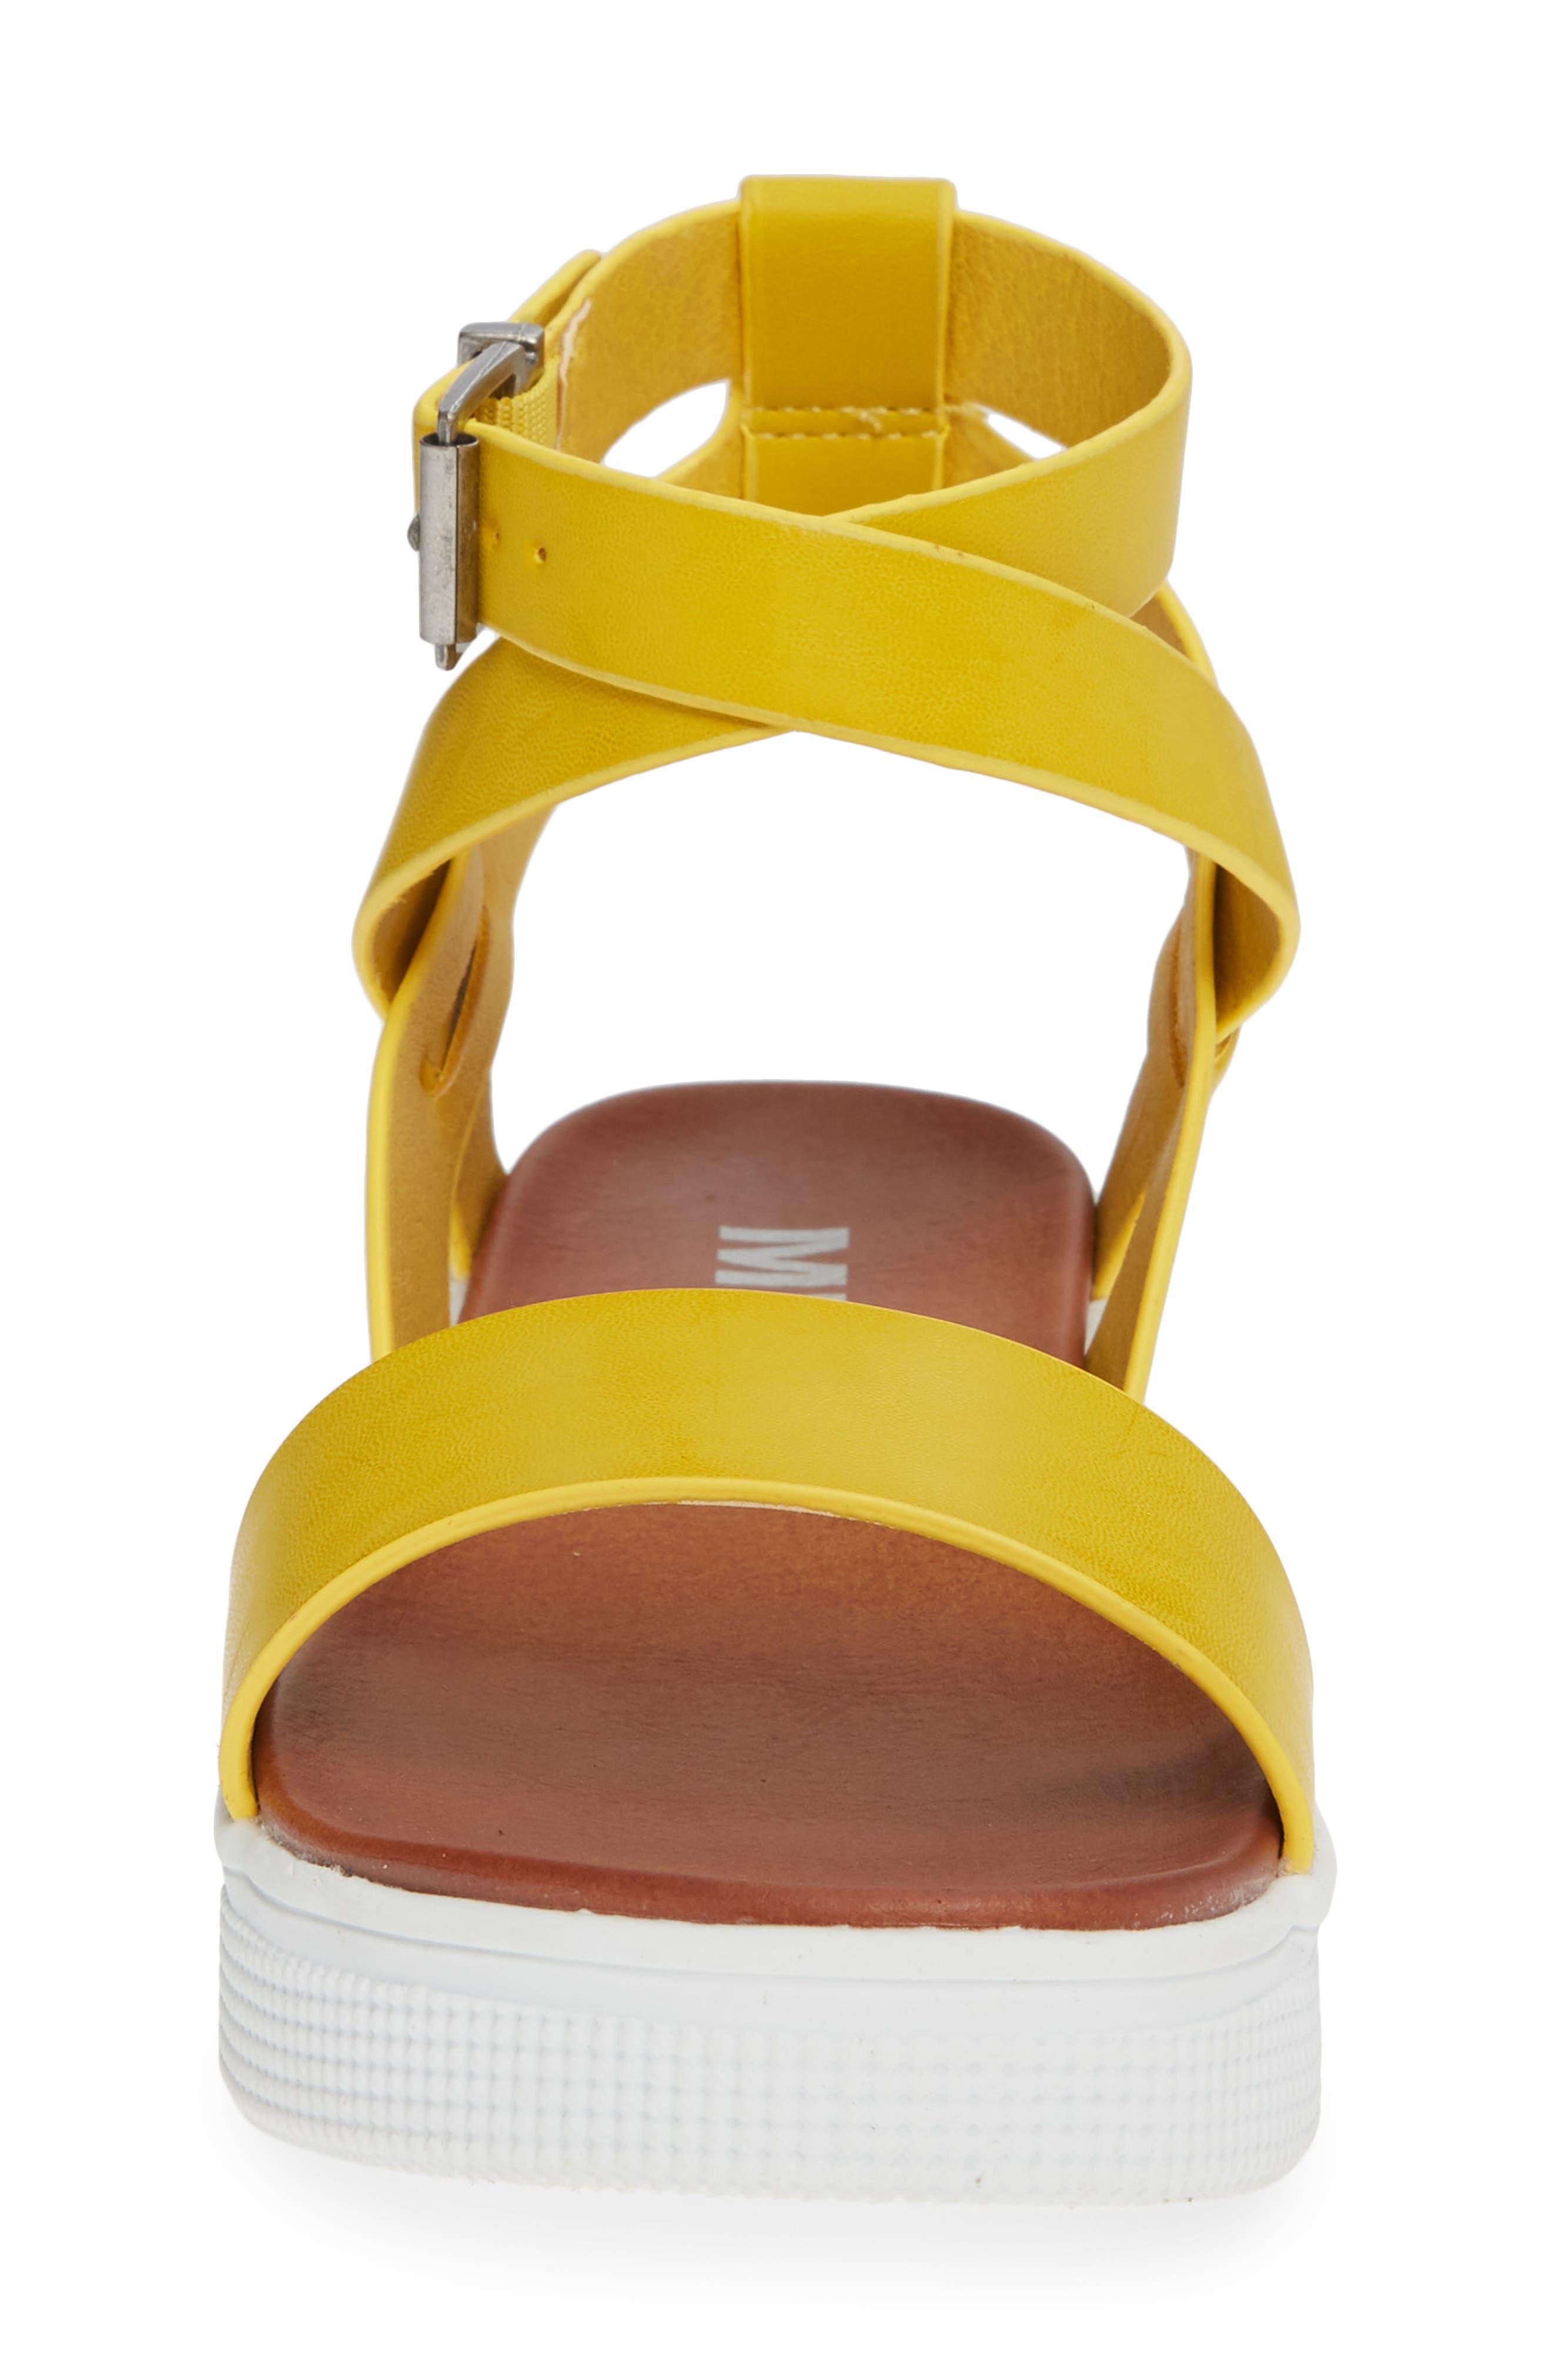 Calla Platform Sandal,                             Alternate thumbnail 4, color,                             YELLOW FAUX LEATHER